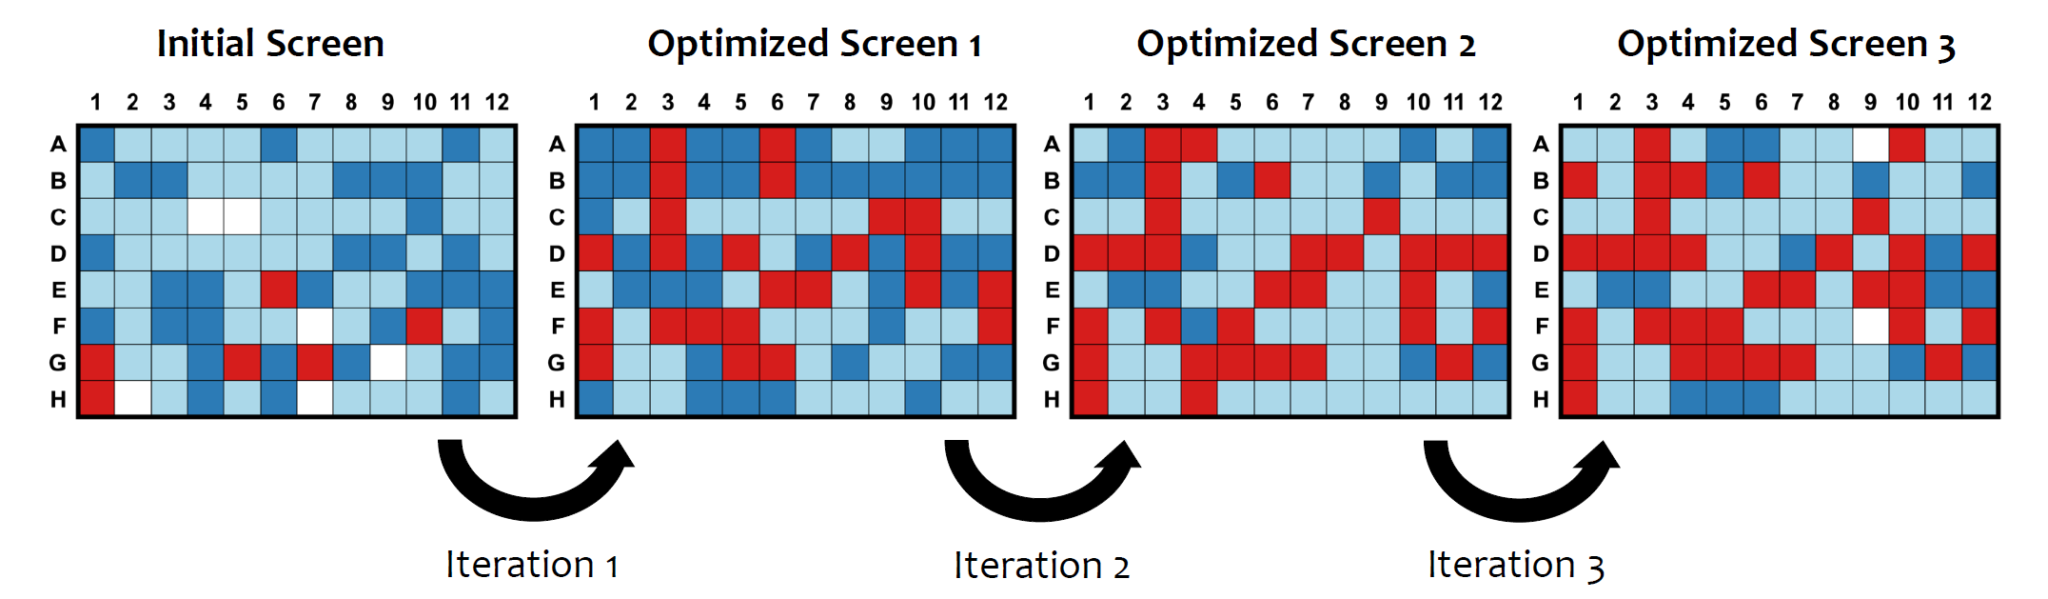 iterative-screen-optimization-iterations